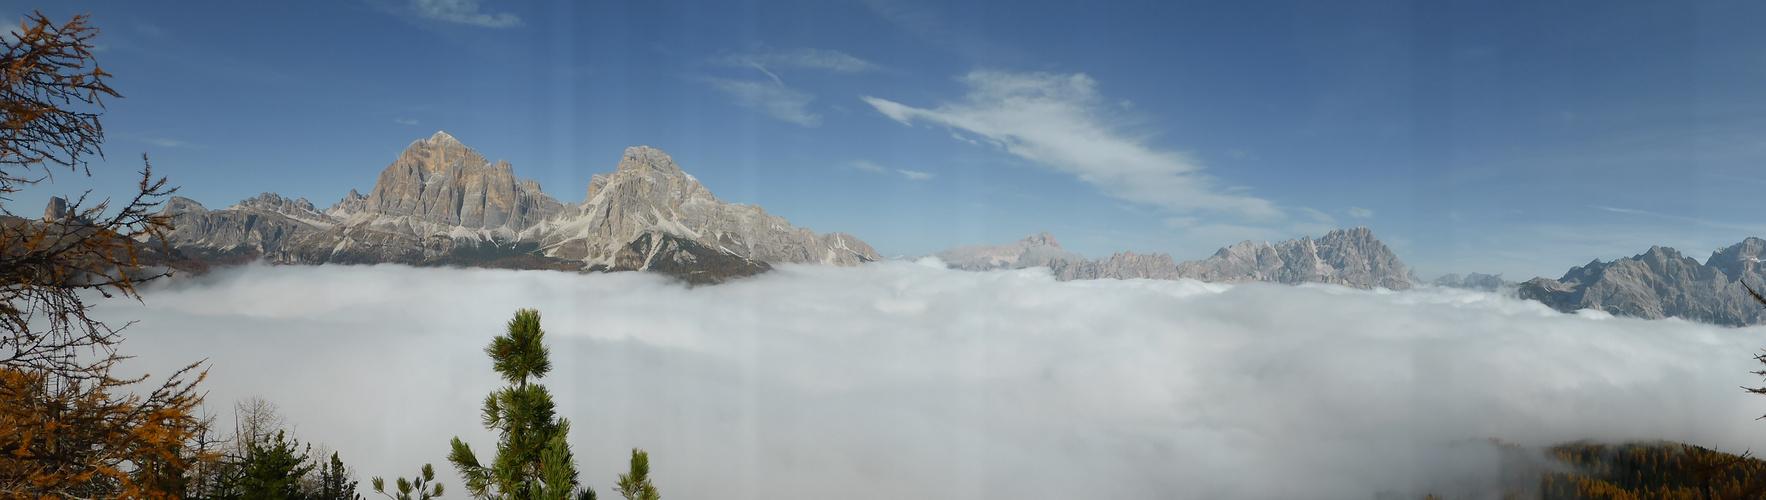 Dichter Nebel im Tal